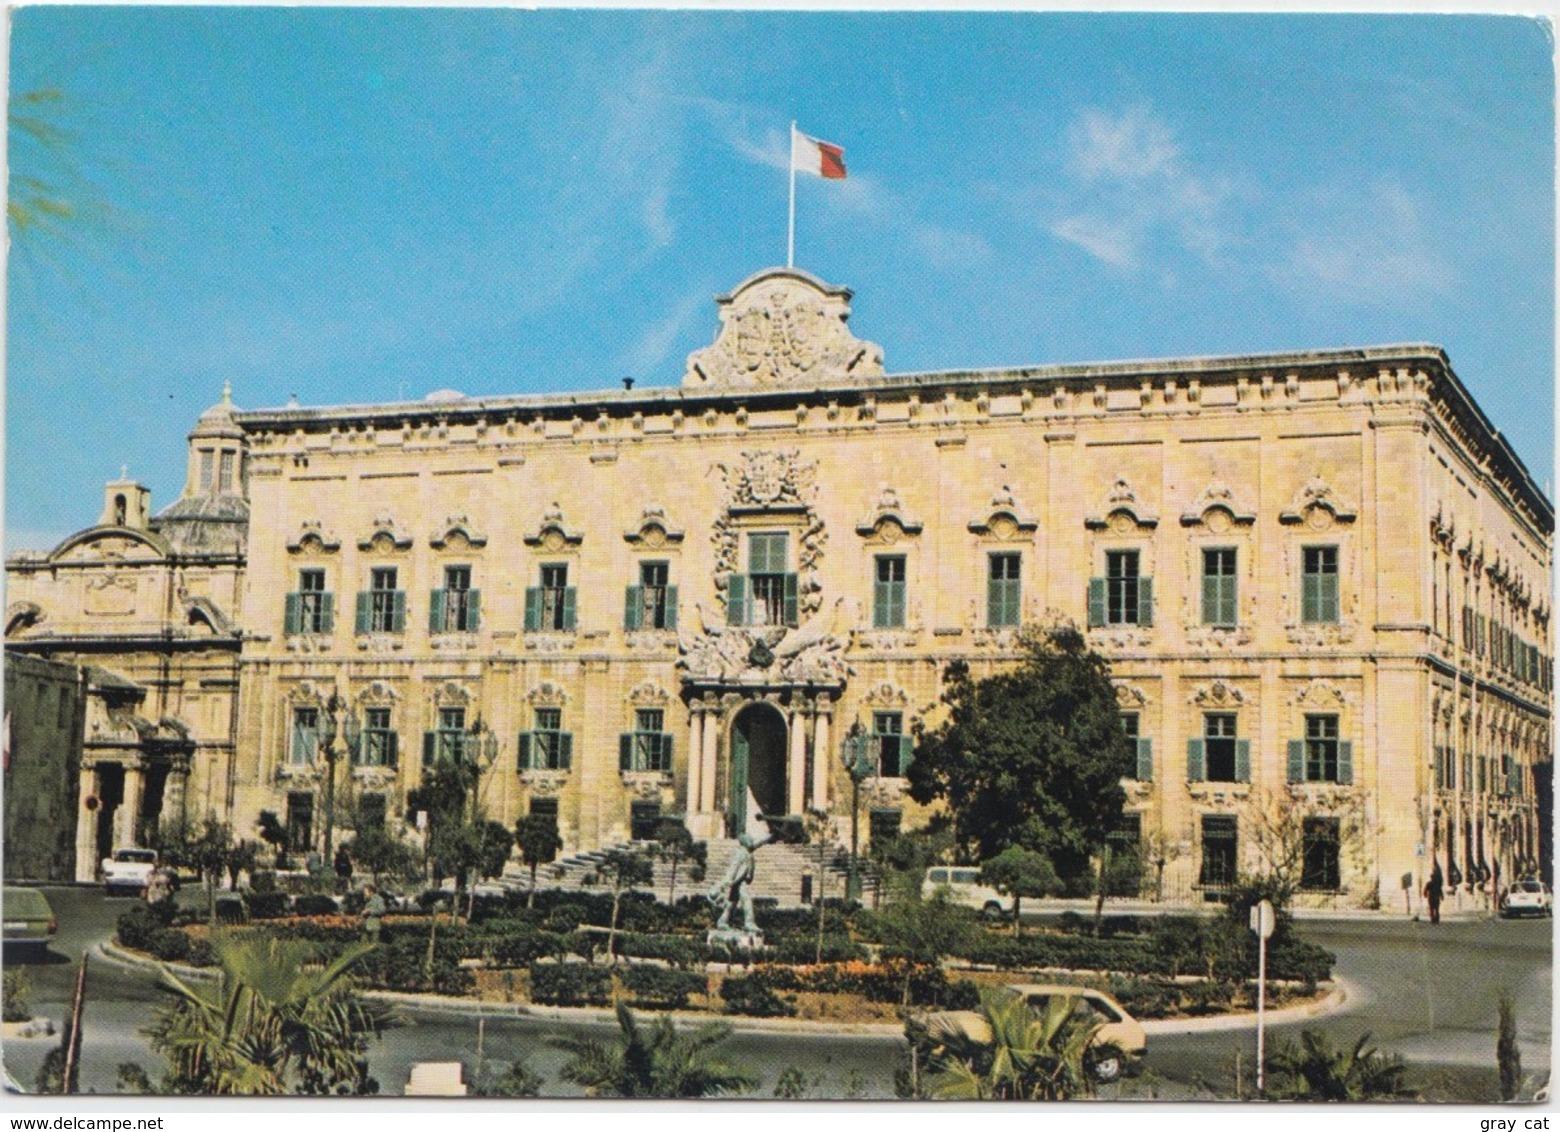 MALTA, Auberge De Castille, Valletta, Used Postcard [21063] - Malta